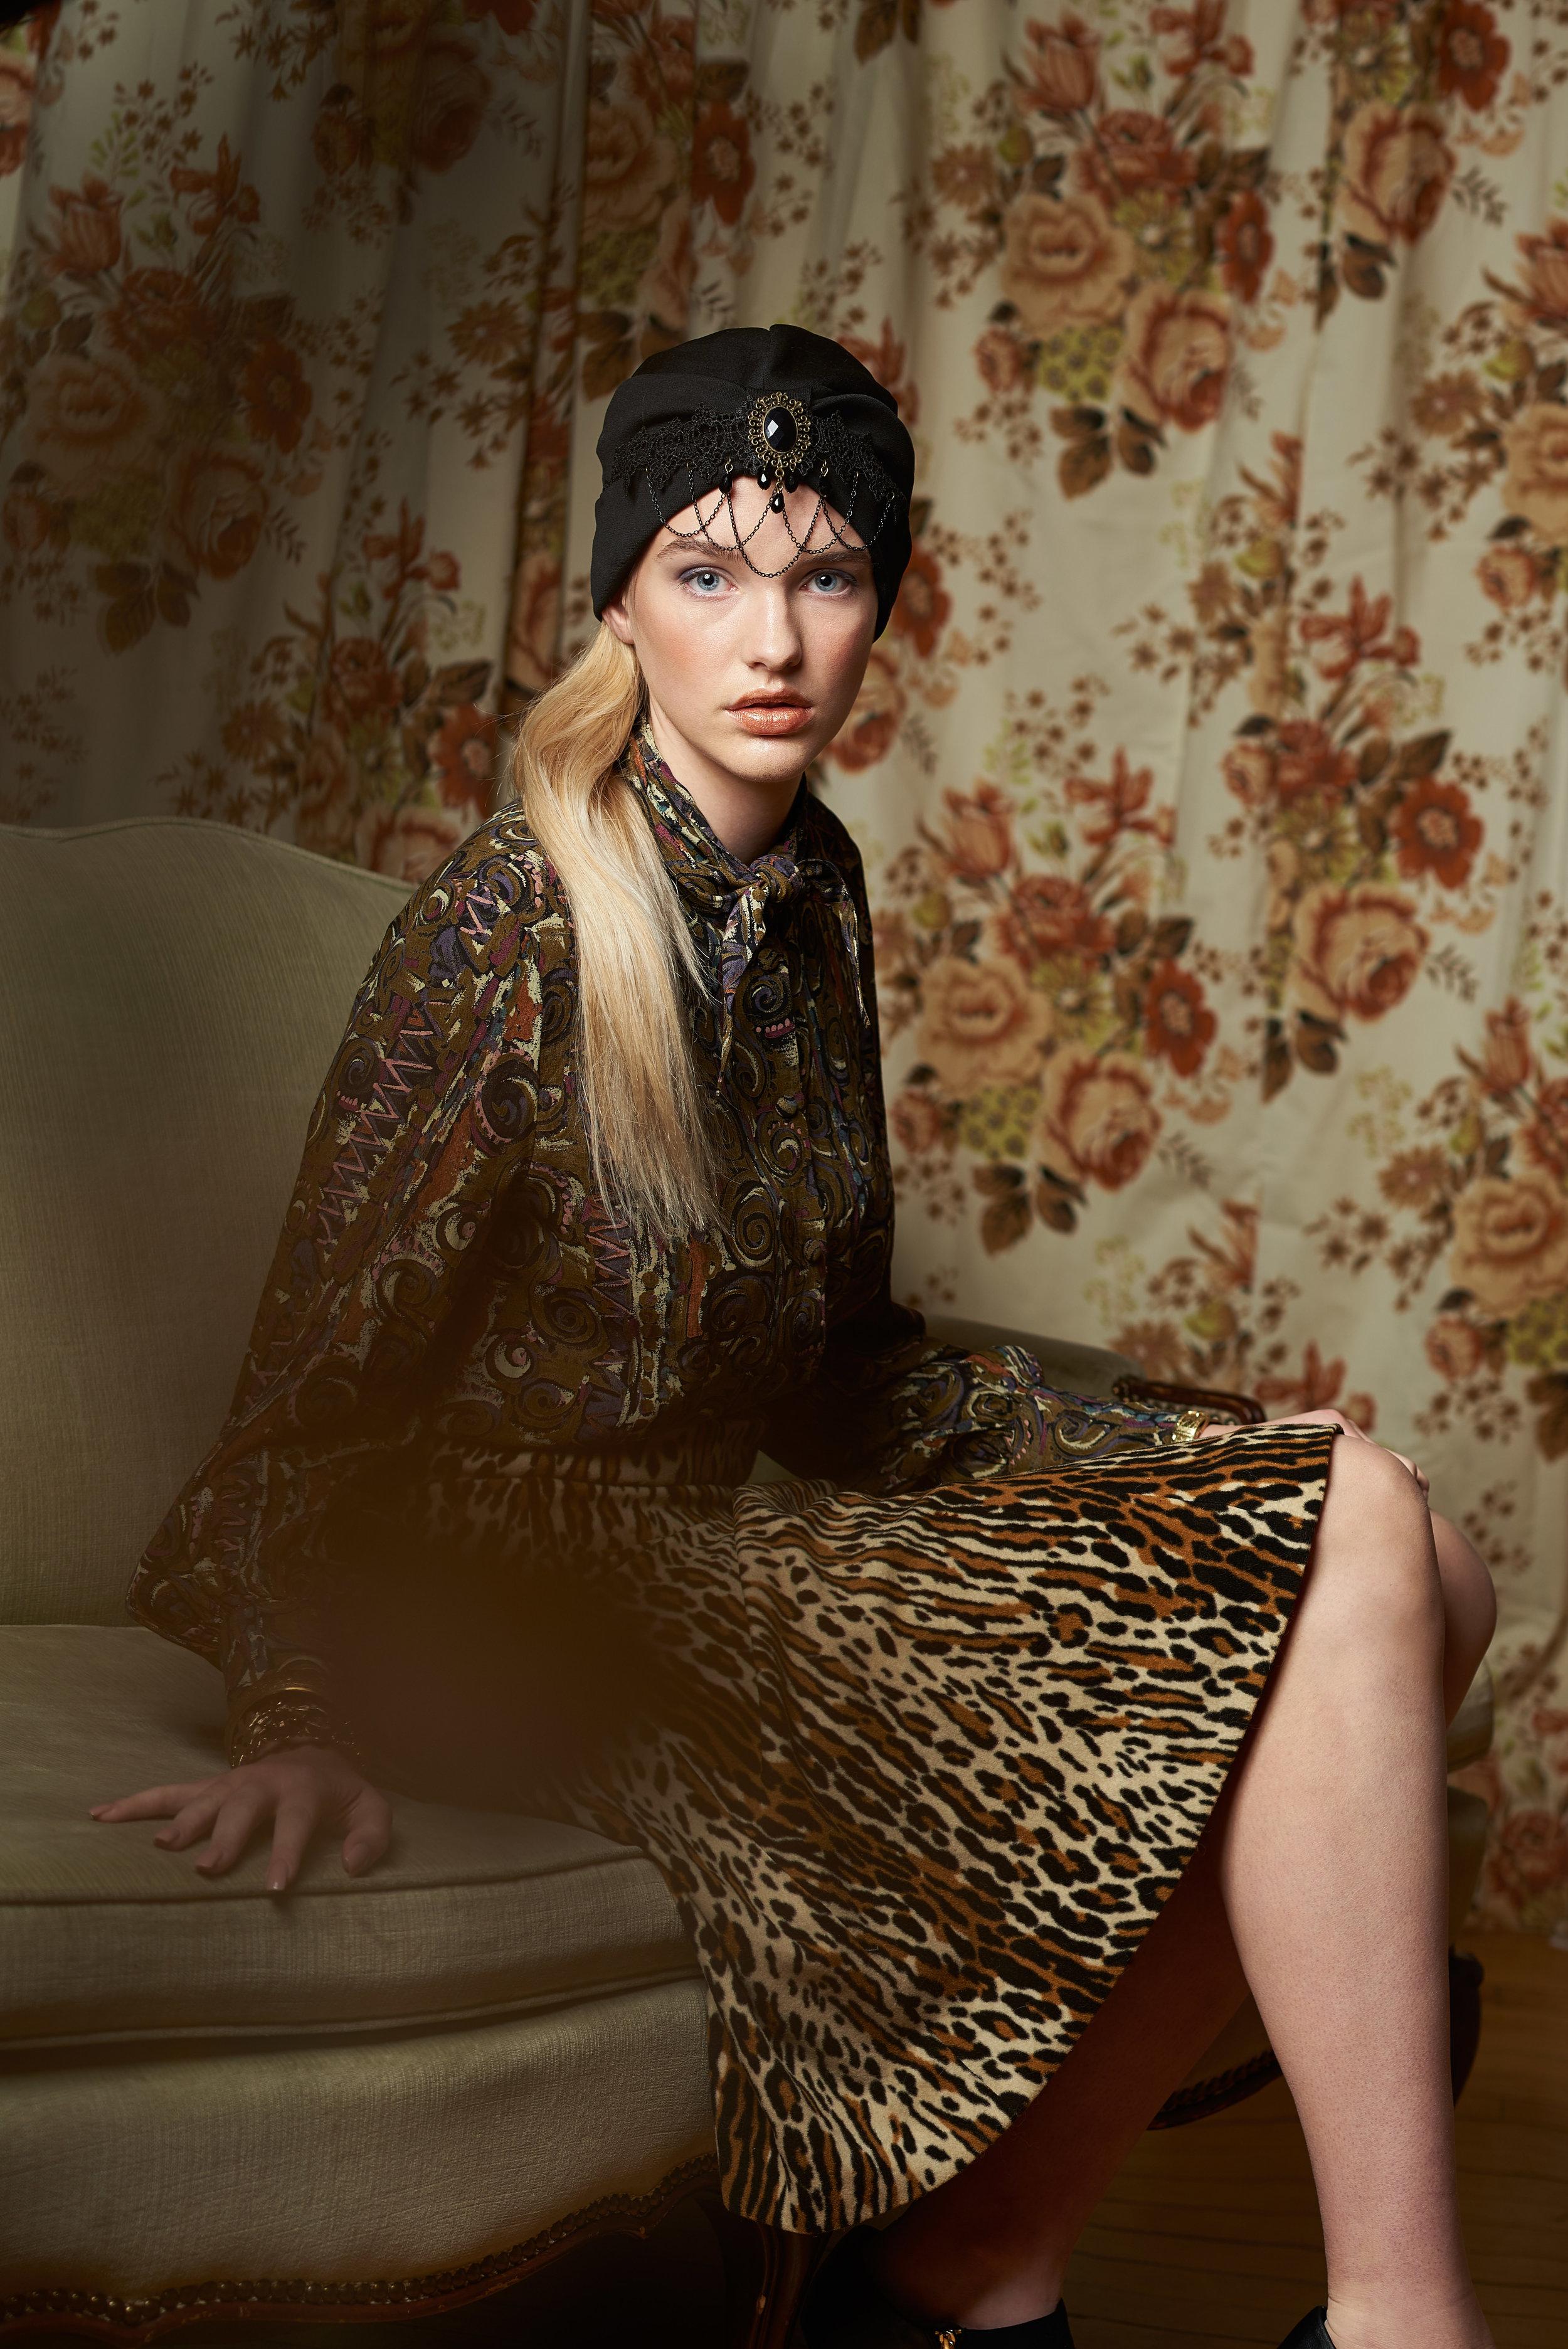 Marta-Hewson-Emily-Hopkins-model-shoot-0699.jpg